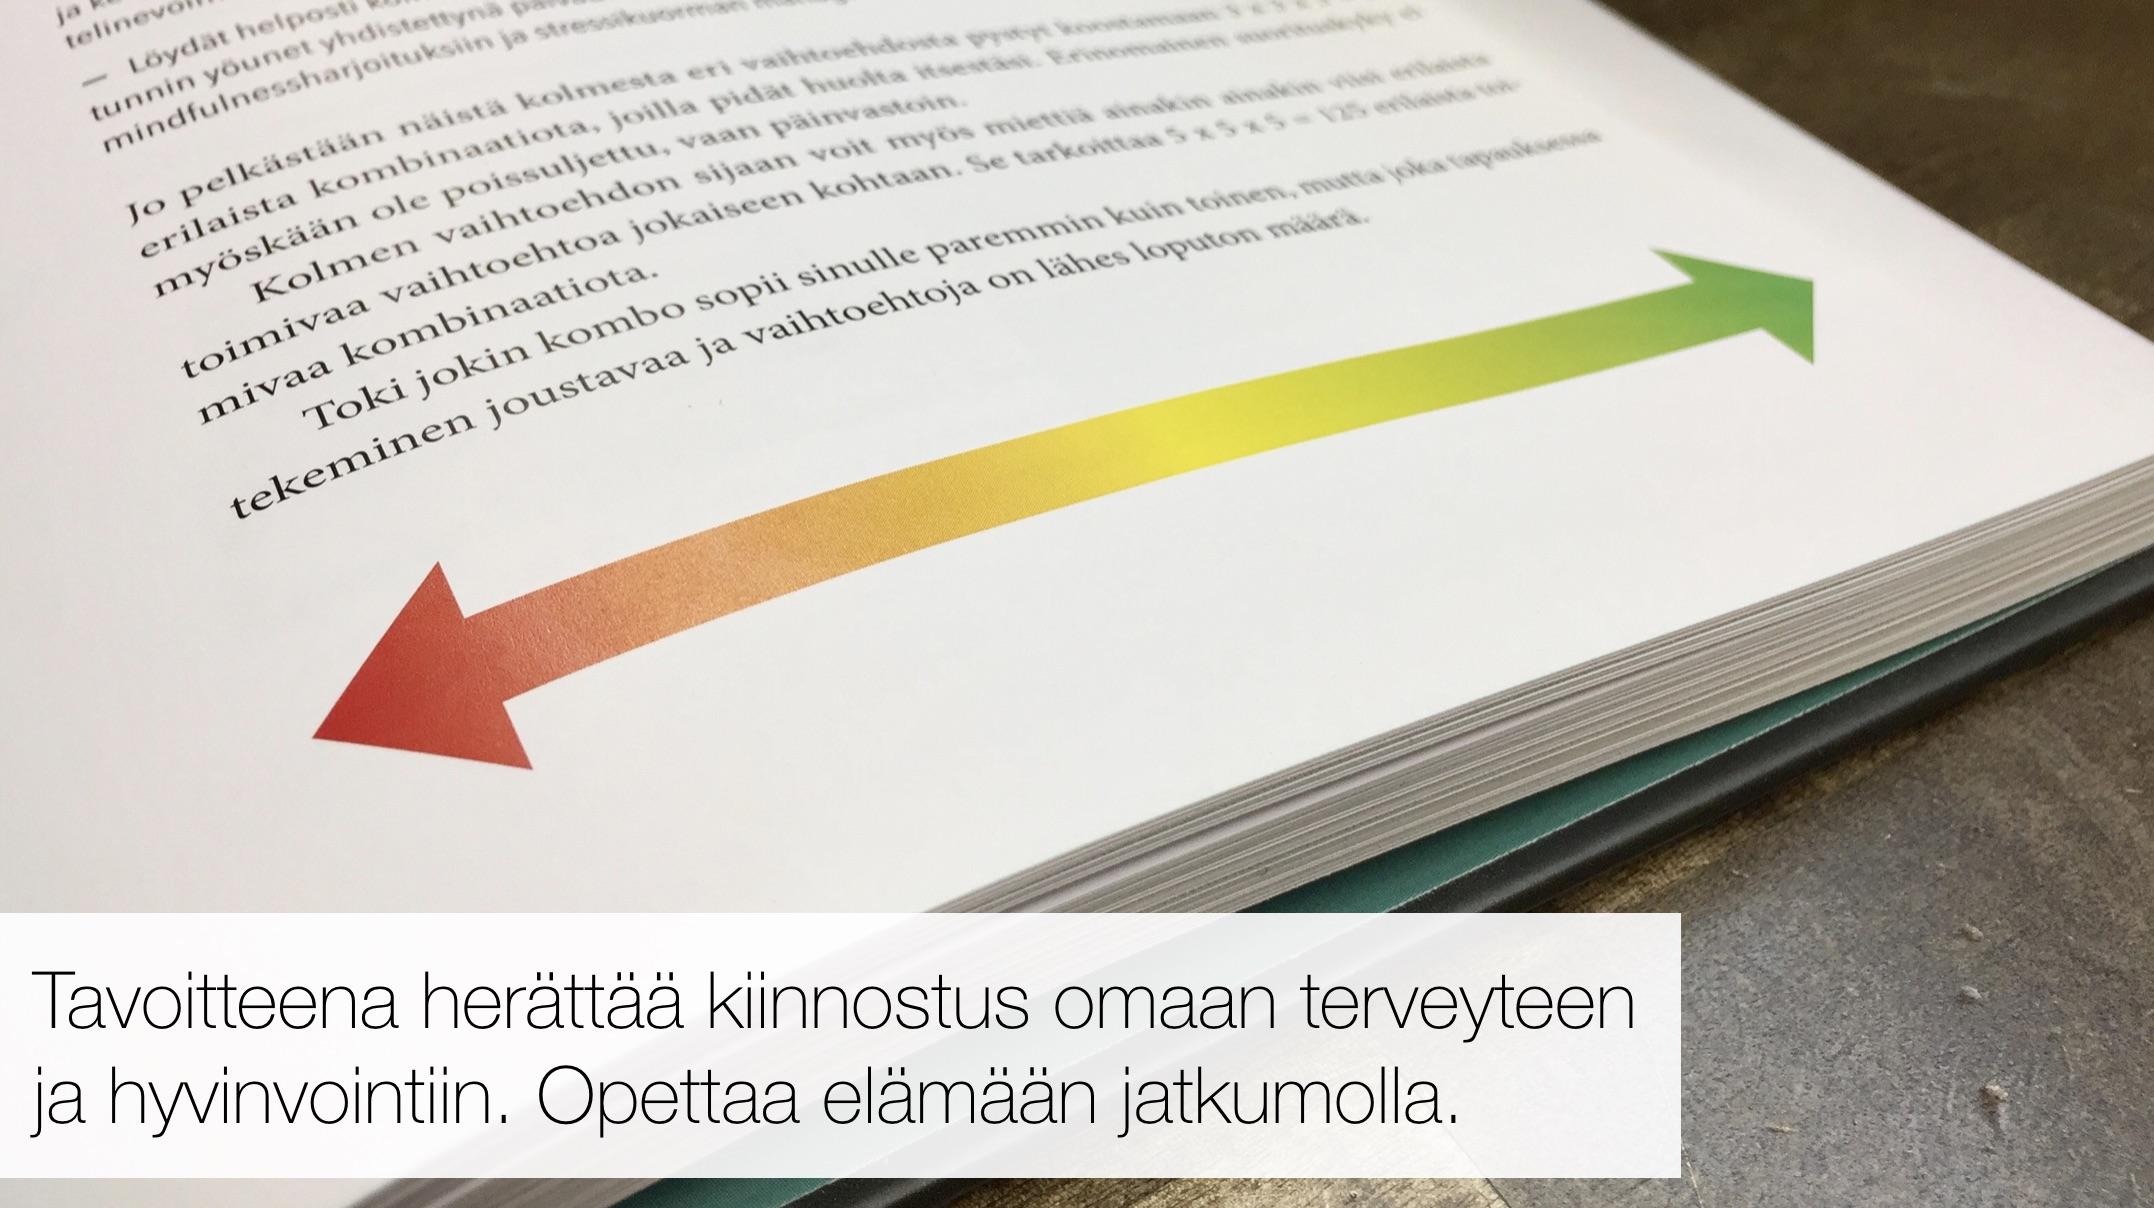 luento5.jpg